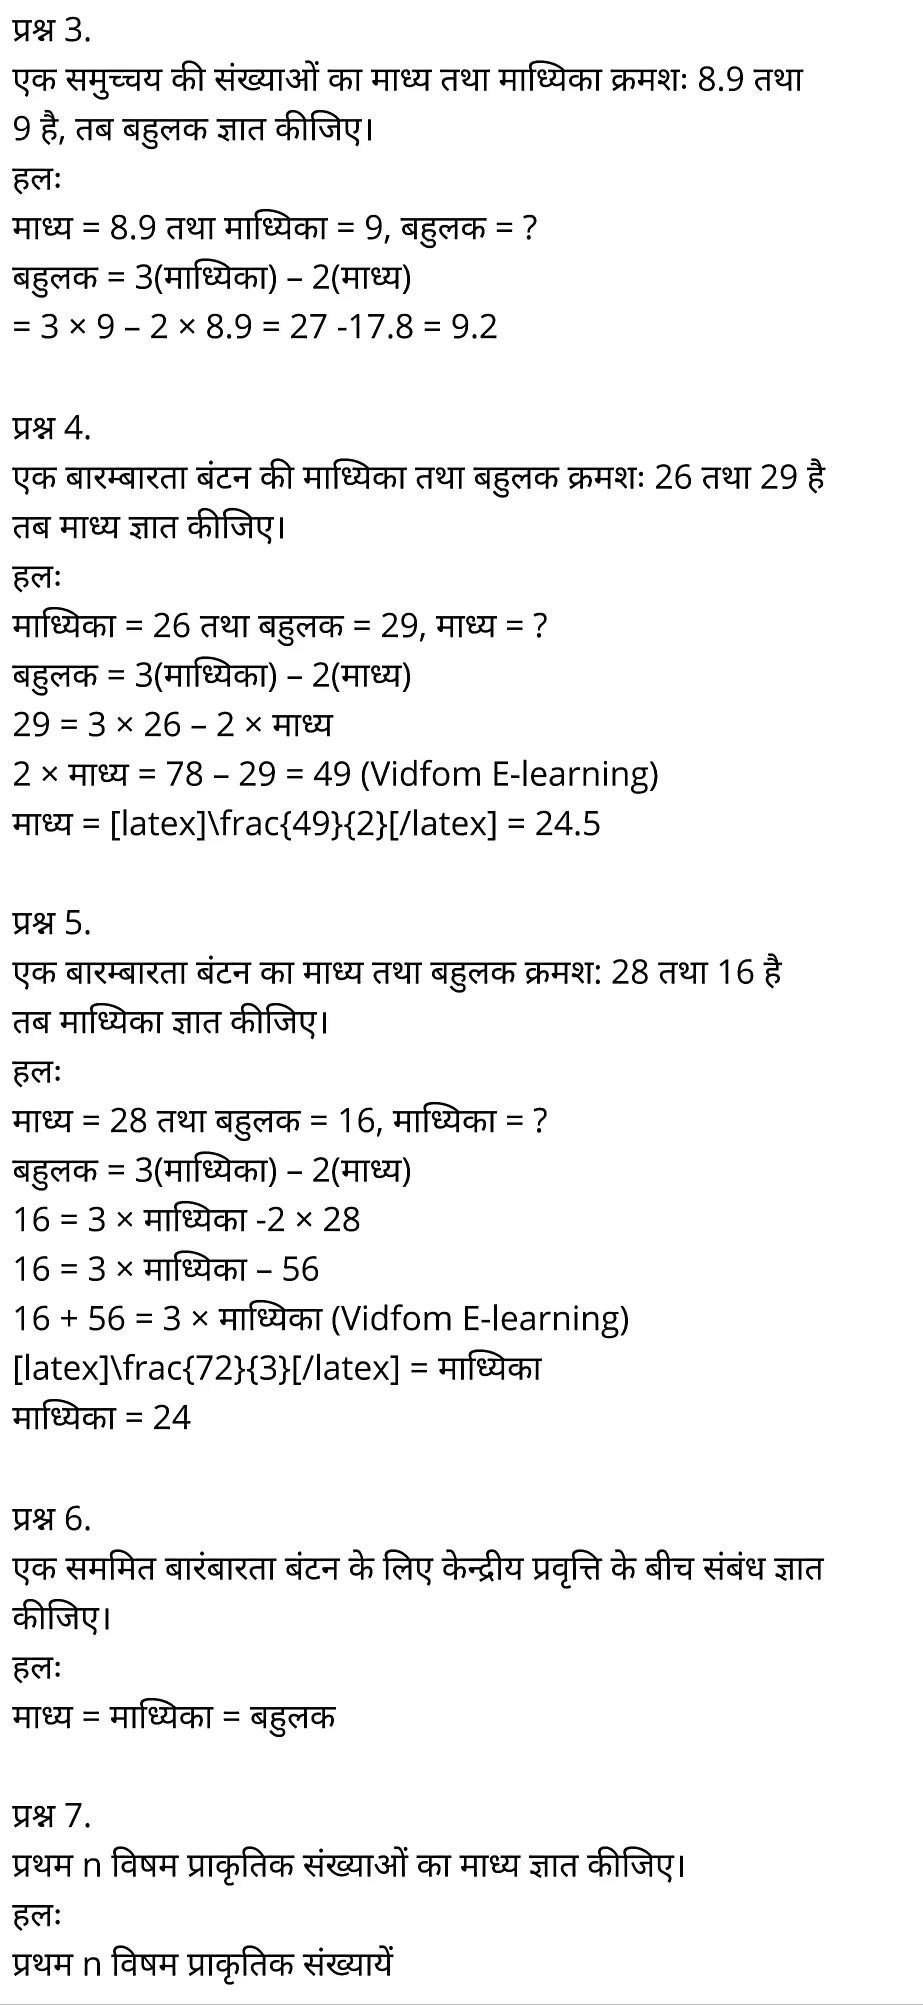 Chapter 14 Statistics Ex 14.1, Chapter 14 Statistics Ex 14.2, Chapter 14 Statistics Ex 14.3, Chapter 14 Statistics Ex 14.4, Chapter 14 Statistics Ex 14.5, Chapter 14 Statistics Ex 14.6, कक्षा 10 बालाजी गणित  के नोट्स  हिंदी में एनसीईआरटी समाधान,     class 10 Balaji Maths Chapter 14,   class 10 Balaji Maths Chapter 14 ncert solutions in Hindi,   class 10 Balaji Maths Chapter 14 notes in hindi,   class 10 Balaji Maths Chapter 14 question answer,   class 10 Balaji Maths Chapter 14 notes,   class 10 Balaji Maths Chapter 14 class 10 Balaji Maths Chapter 14 in  hindi,    class 10 Balaji Maths Chapter 14 important questions in  hindi,   class 10 Balaji Maths Chapter 14 notes in hindi,    class 10 Balaji Maths Chapter 14 test,   class 10 Balaji Maths Chapter 14 pdf,   class 10 Balaji Maths Chapter 14 notes pdf,   class 10 Balaji Maths Chapter 14 exercise solutions,   class 10 Balaji Maths Chapter 14 notes study rankers,   class 10 Balaji Maths Chapter 14 notes,    class 10 Balaji Maths Chapter 14  class 10  notes pdf,   class 10 Balaji Maths Chapter 14 class 10  notes  ncert,   class 10 Balaji Maths Chapter 14 class 10 pdf,   class 10 Balaji Maths Chapter 14  book,   class 10 Balaji Maths Chapter 14 quiz class 10  ,    10  th class 10 Balaji Maths Chapter 14  book up board,   up board 10  th class 10 Balaji Maths Chapter 14 notes,  class 10 Balaji Maths,   class 10 Balaji Maths ncert solutions in Hindi,   class 10 Balaji Maths notes in hindi,   class 10 Balaji Maths question answer,   class 10 Balaji Maths notes,  class 10 Balaji Maths class 10 Balaji Maths Chapter 14 in  hindi,    class 10 Balaji Maths important questions in  hindi,   class 10 Balaji Maths notes in hindi,    class 10 Balaji Maths test,  class 10 Balaji Maths class 10 Balaji Maths Chapter 14 pdf,   class 10 Balaji Maths notes pdf,   class 10 Balaji Maths exercise solutions,   class 10 Balaji Maths,  class 10 Balaji Maths notes study rankers,   class 10 Balaji Maths notes,  class 10 Balaji Maths notes,   cla